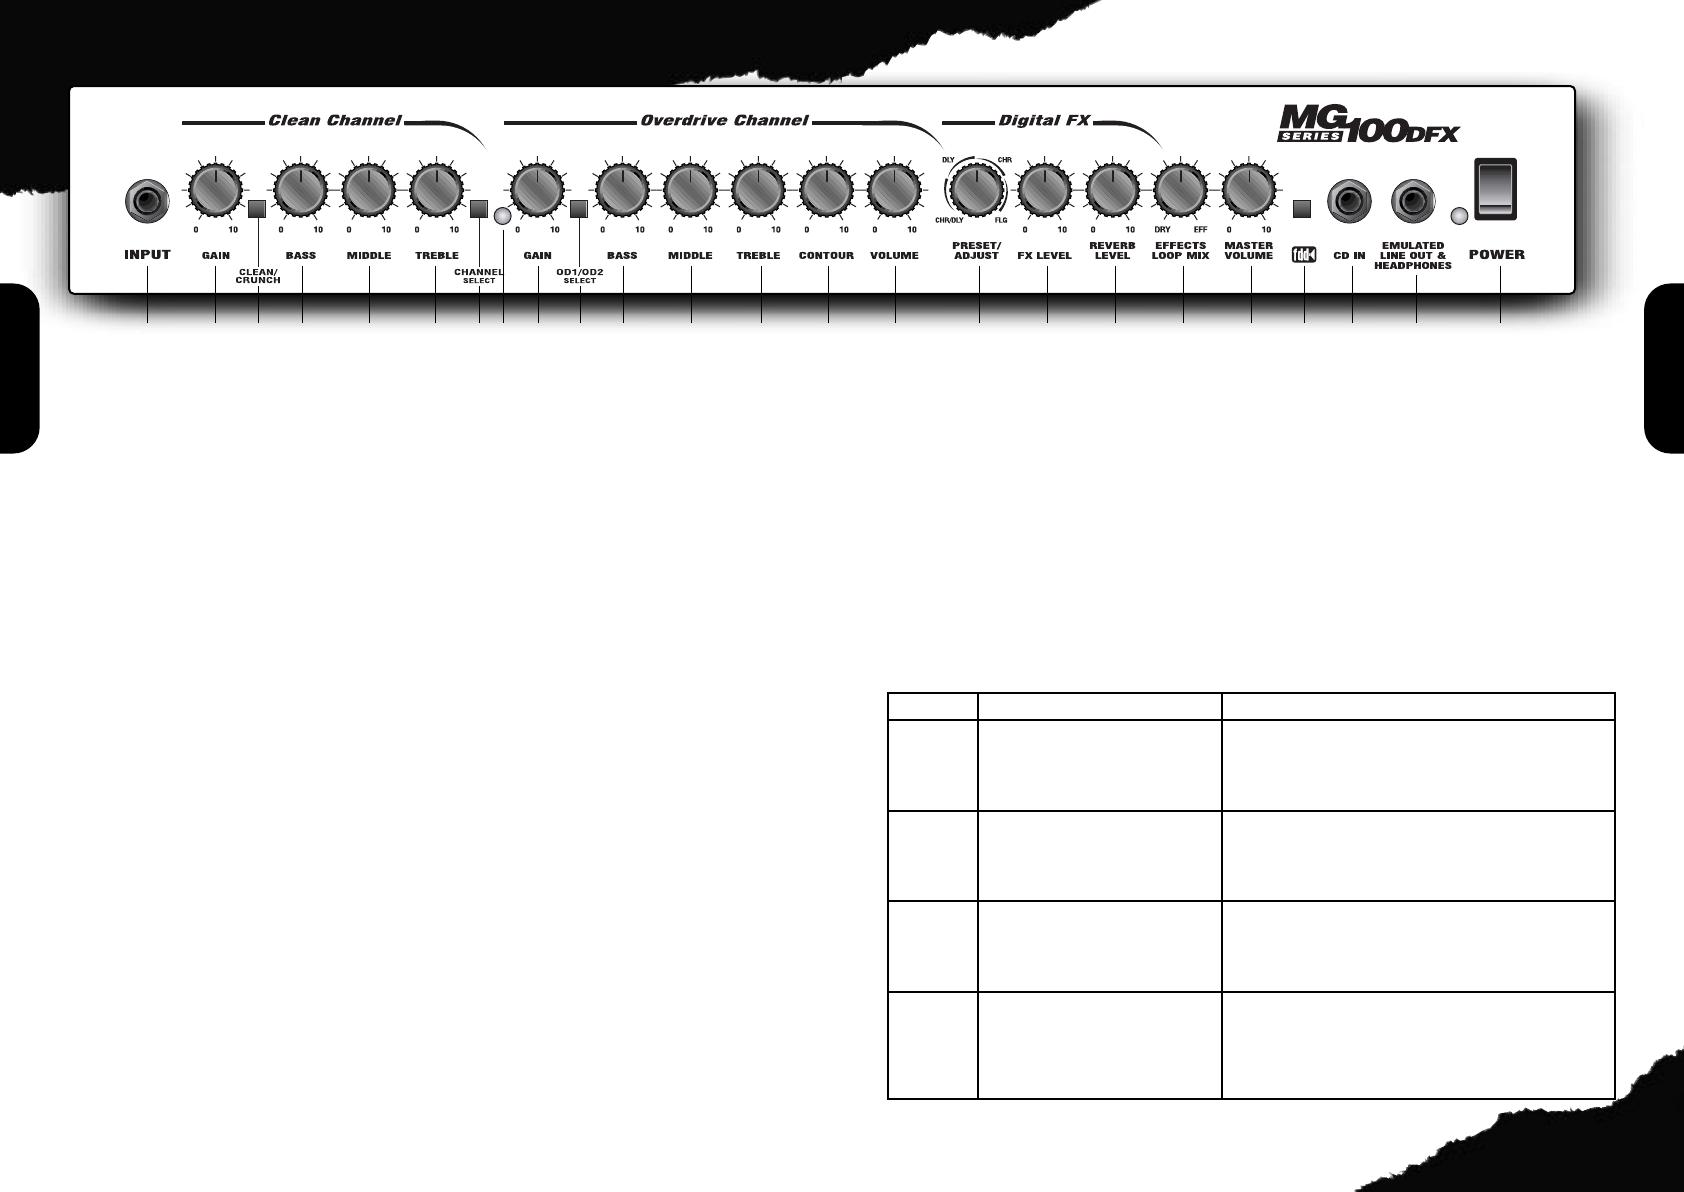 handleiding marshall mg100dfx mg100hdfx pagina 3 van 6 english rh gebruikershandleiding com marshall mg100dfx manual español marshall mg100dfx manual español